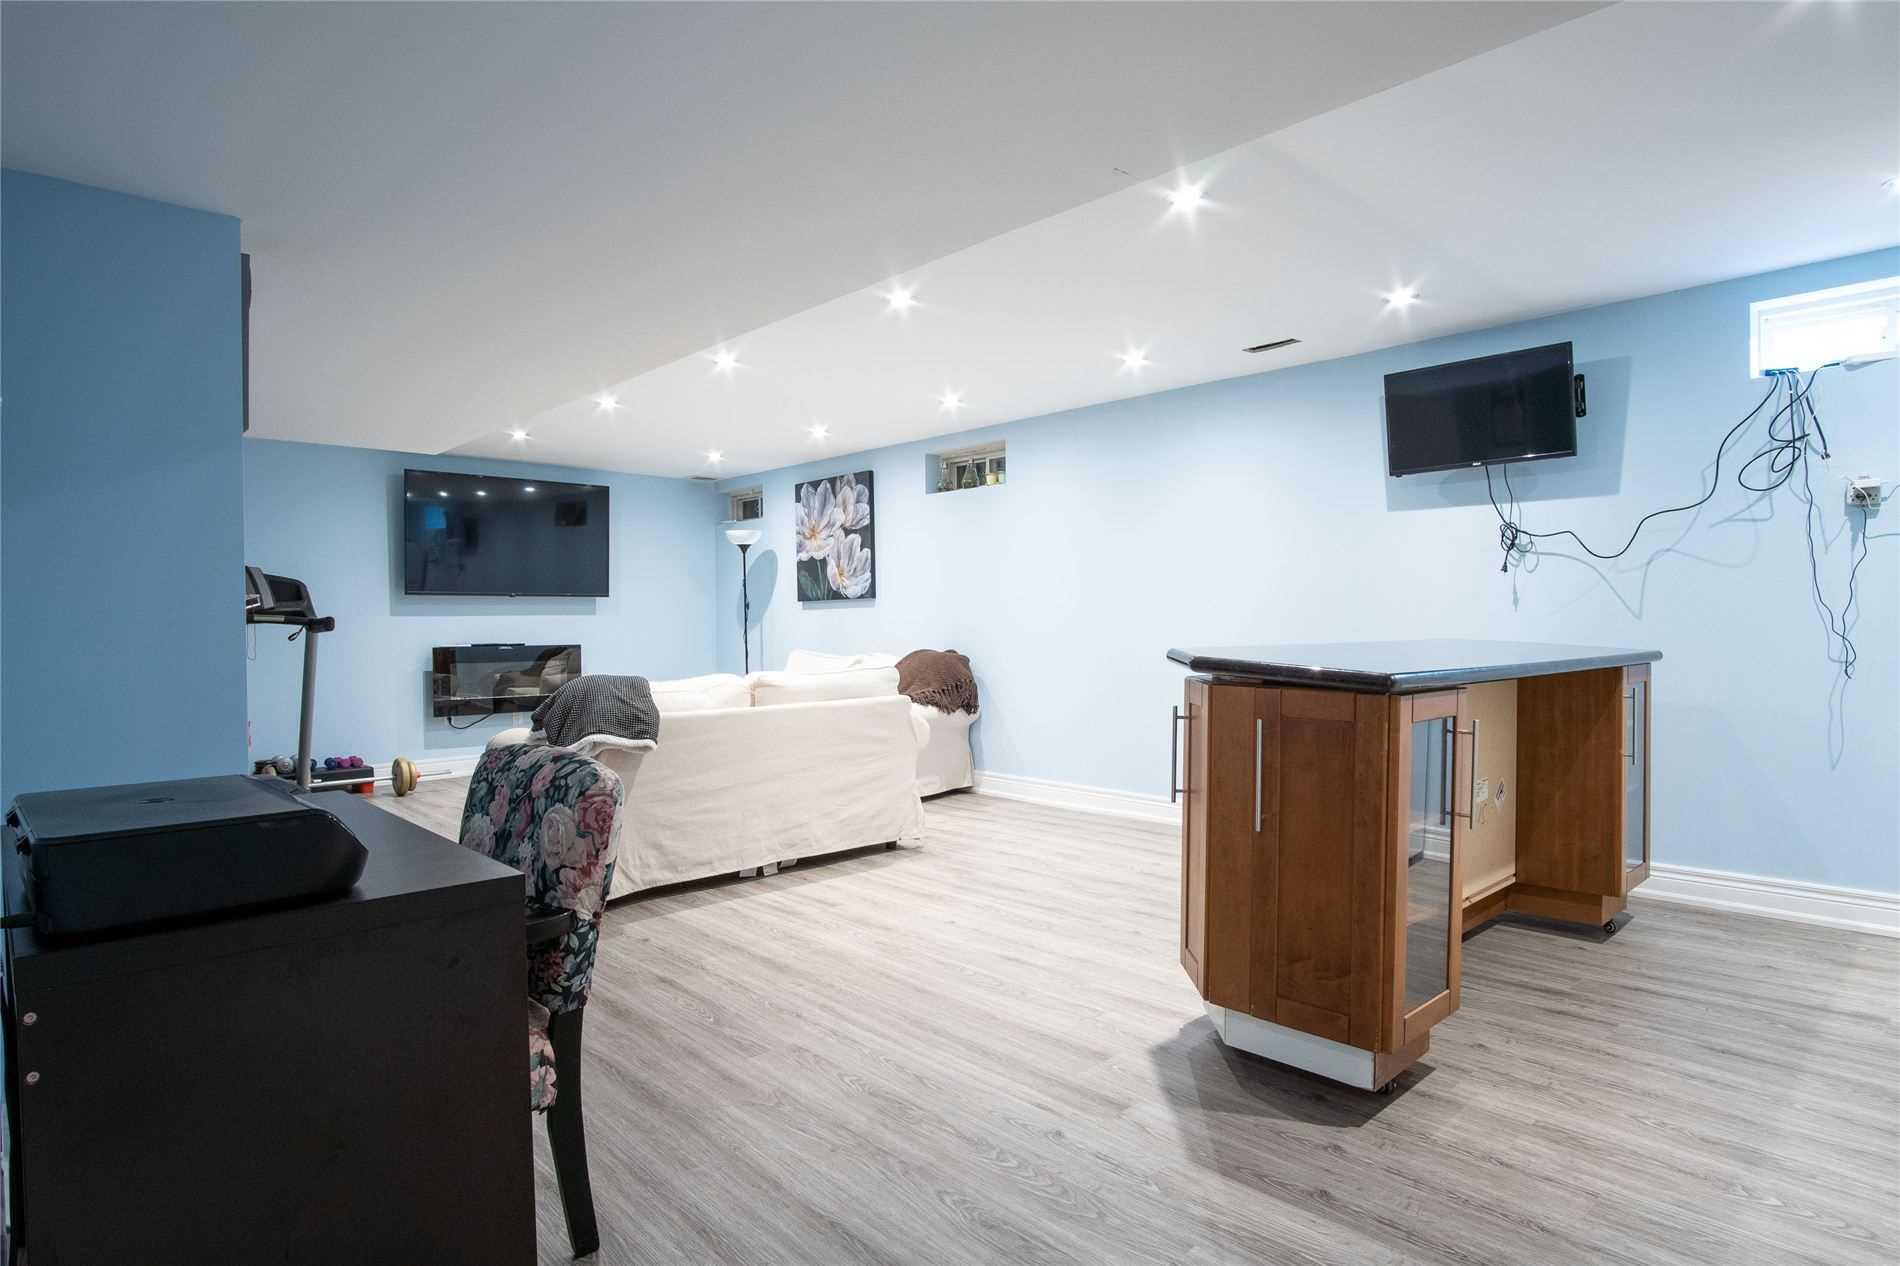 827 Biggar Hts - Coates Detached for sale, 4 Bedrooms (W5400280) - #31